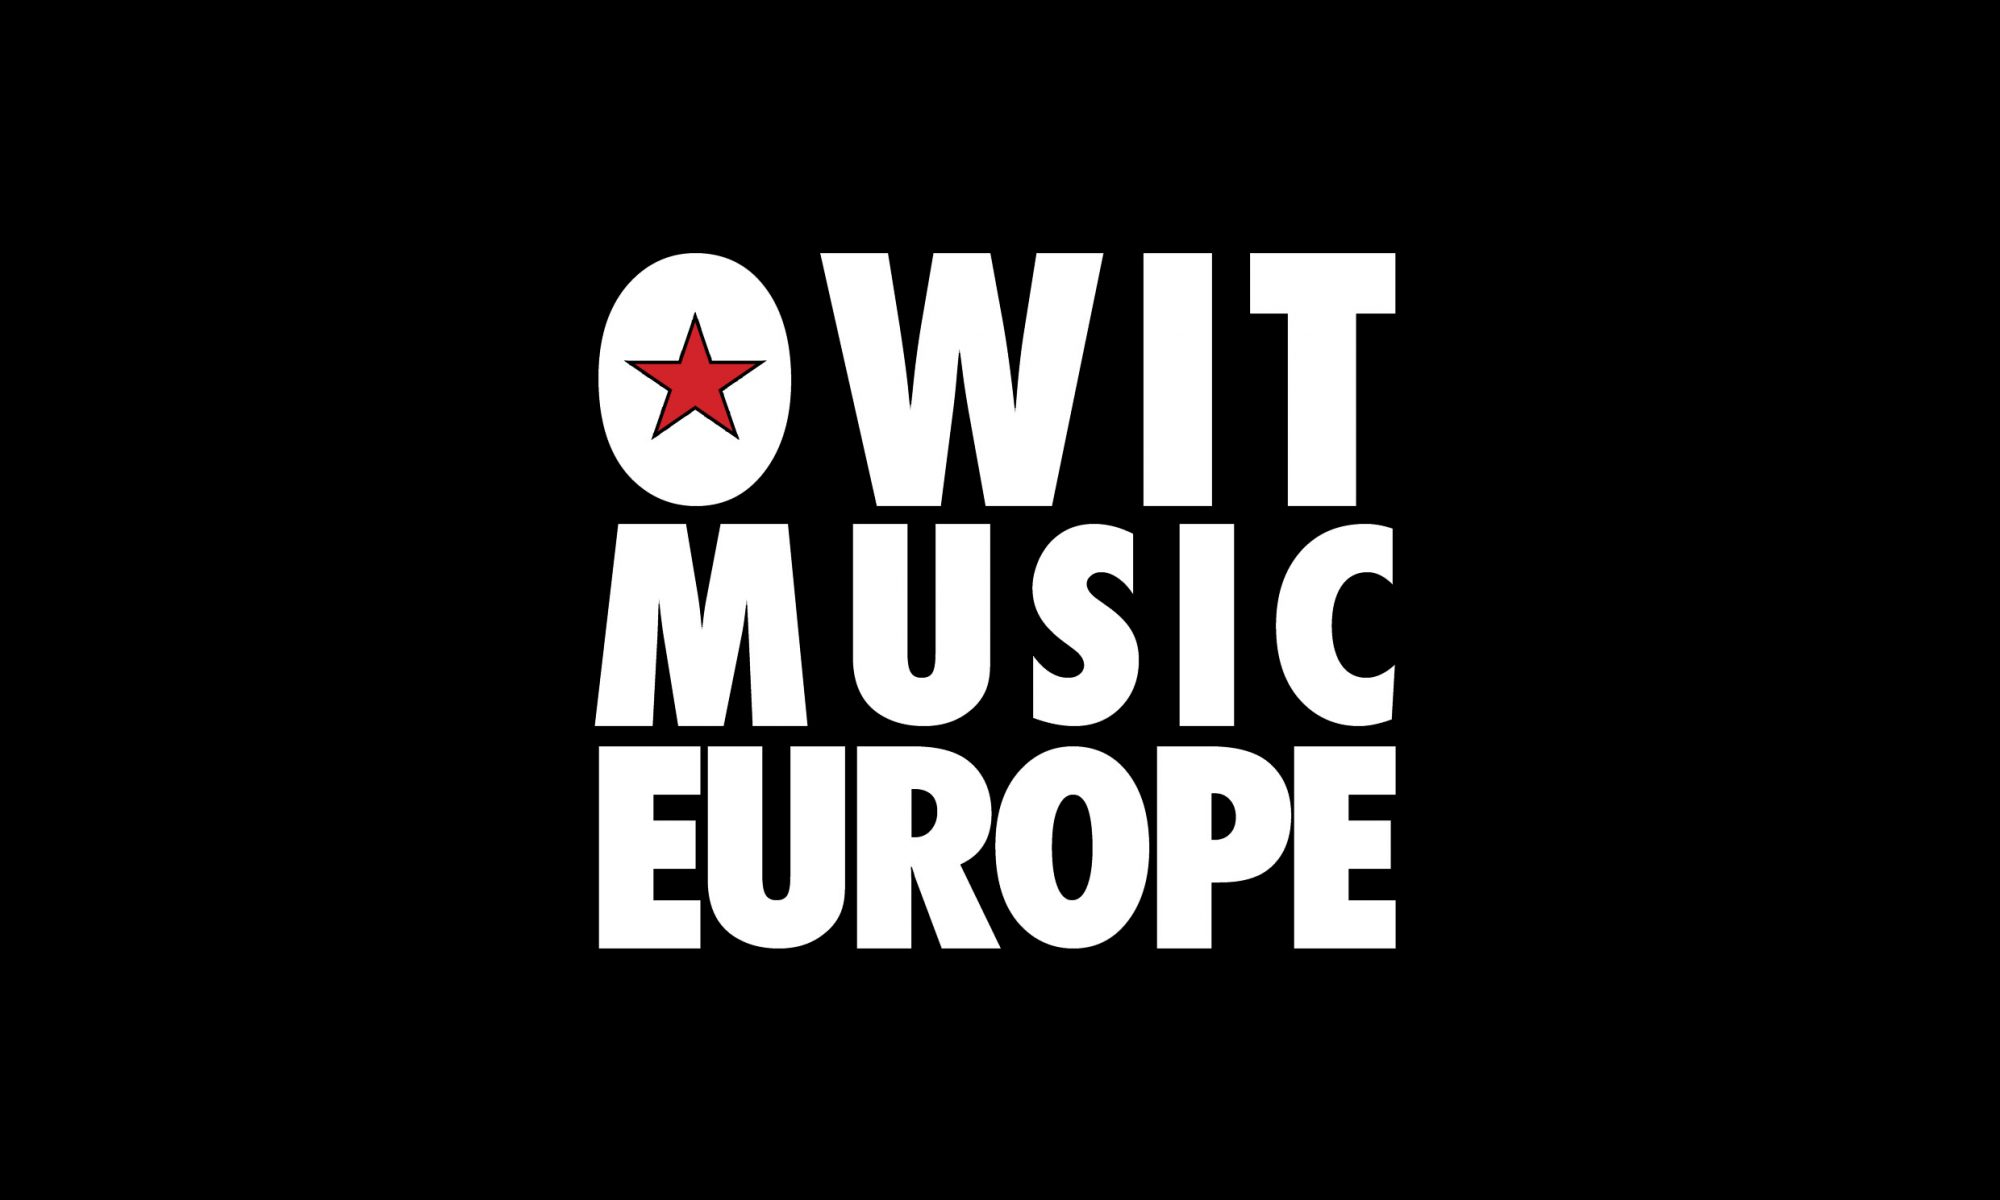 OWIT MUSIC